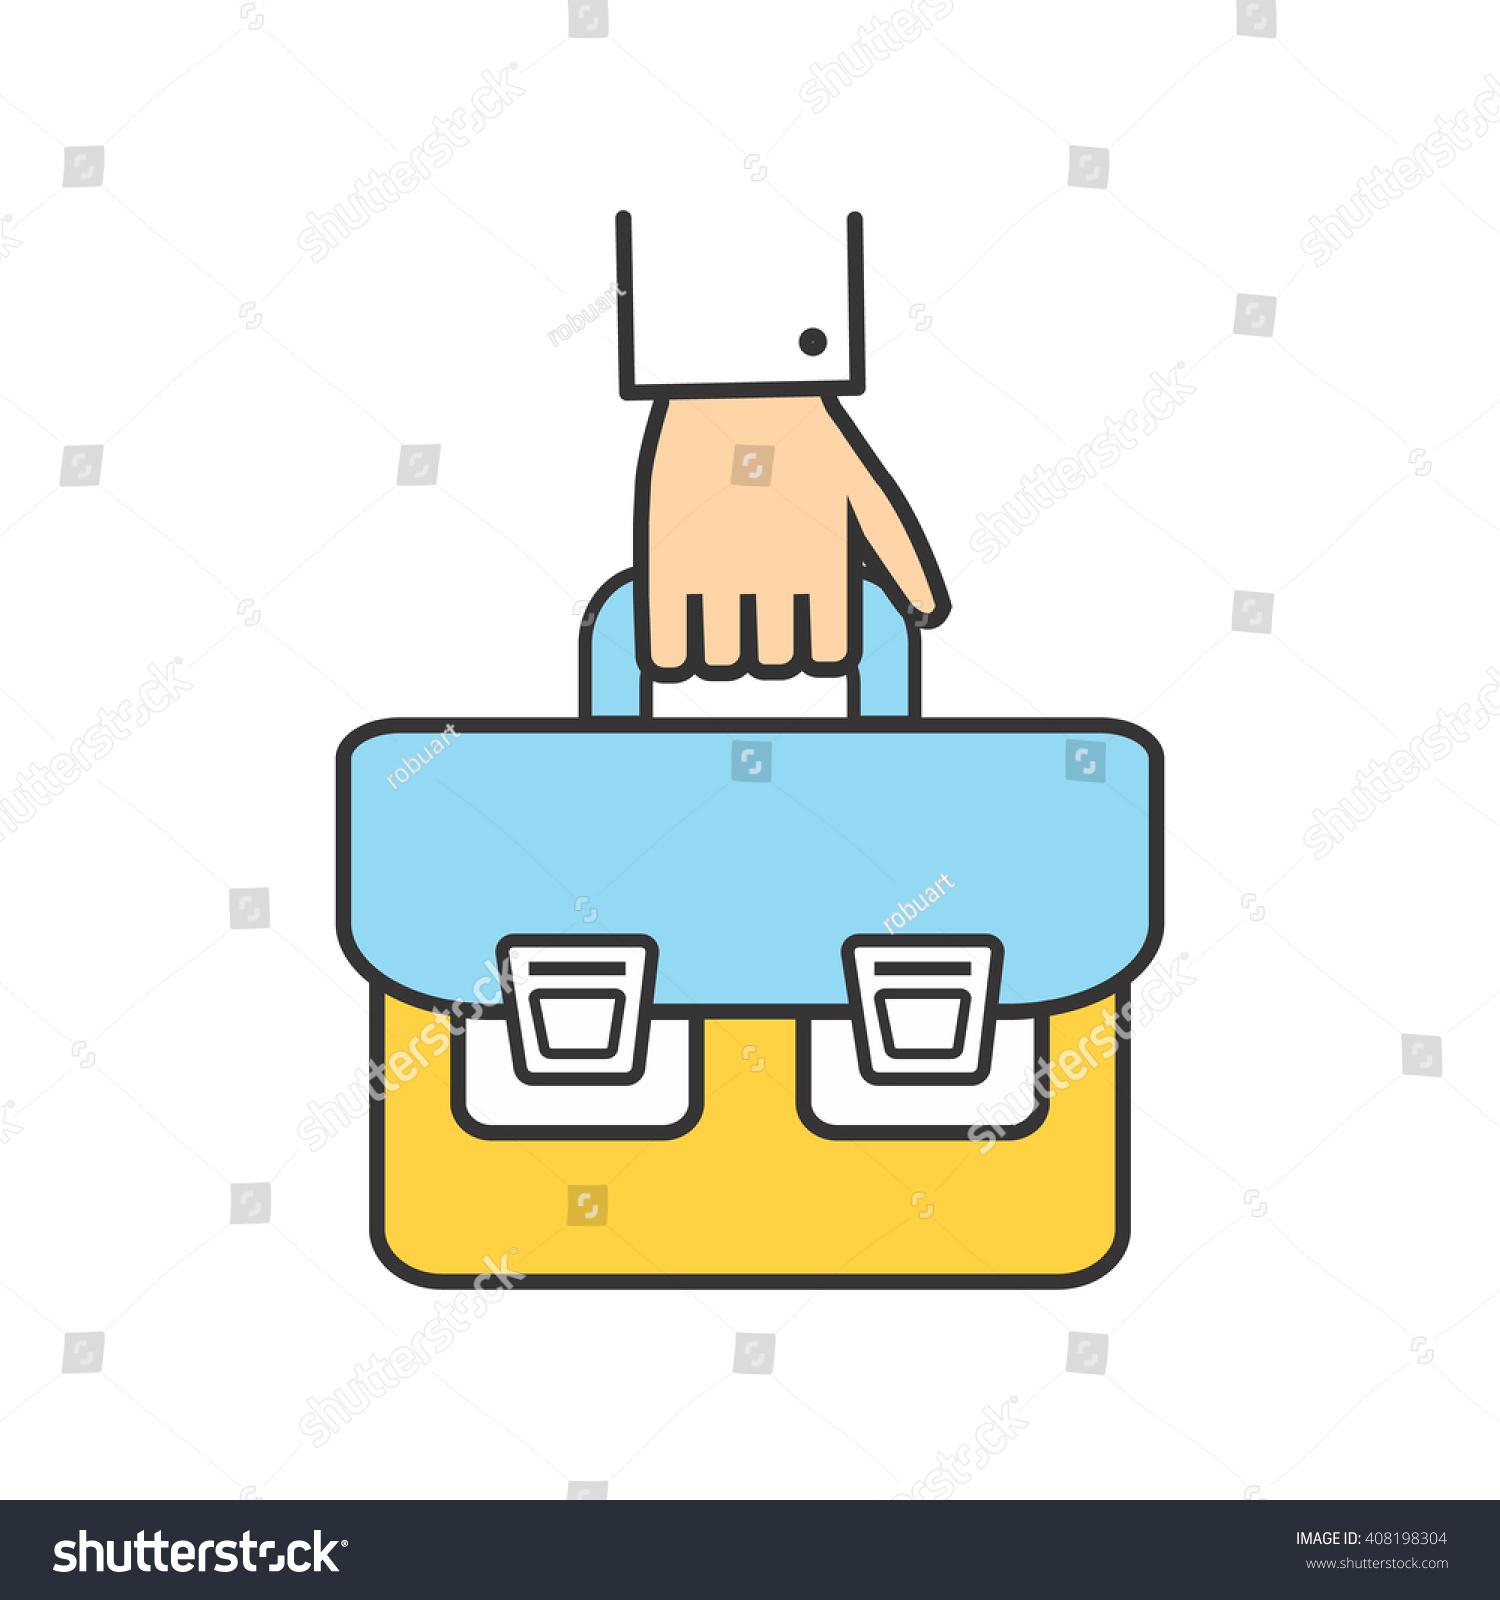 School bag diagram - Hand Briefcase Logo Icon Success Businessman Bag Office Man With Briefcase In Hand